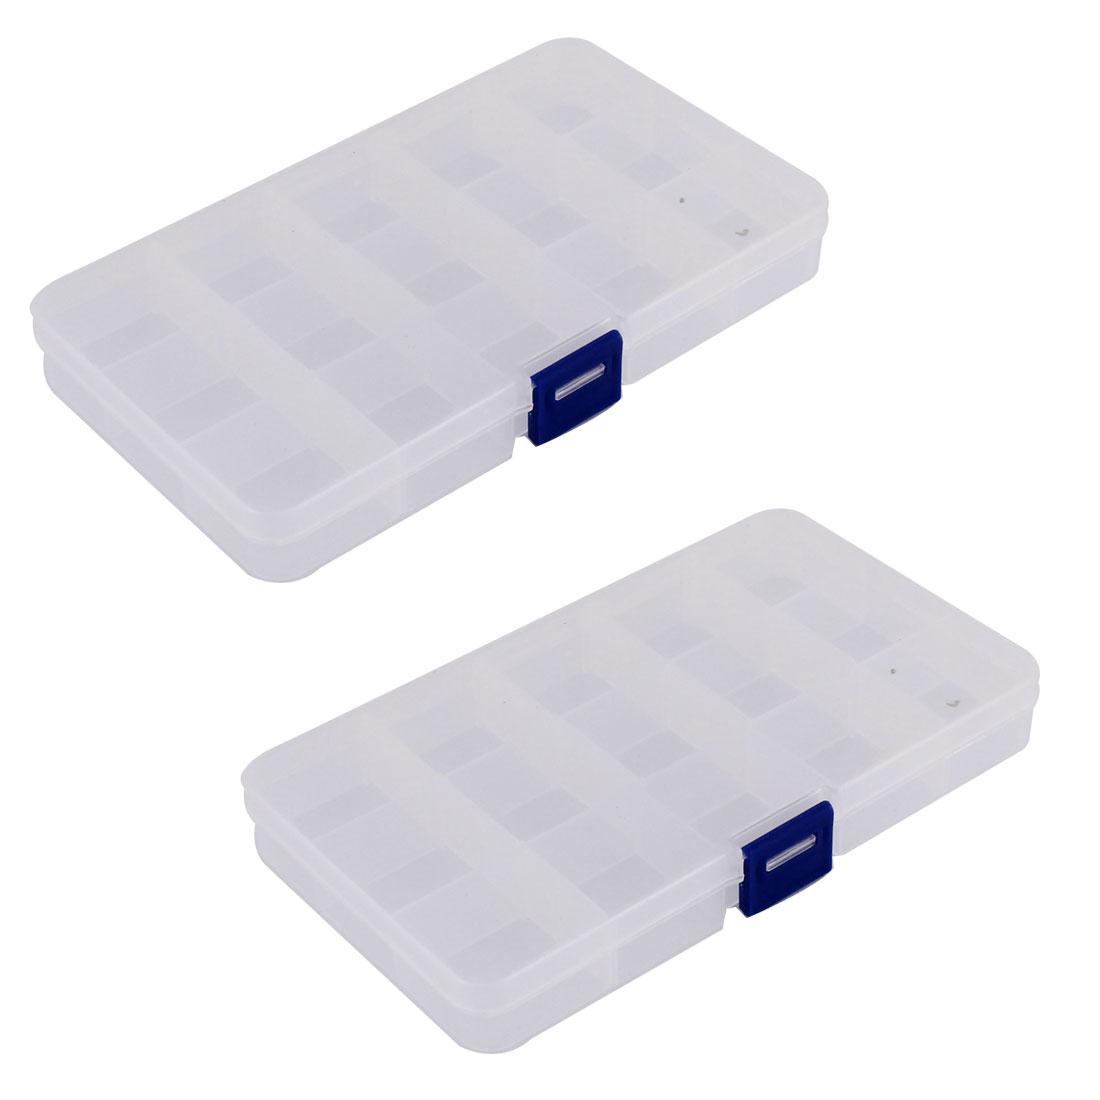 Medicine Jewellery Plastic 15 Slots Storage Box Case Organizer Container 2pcs